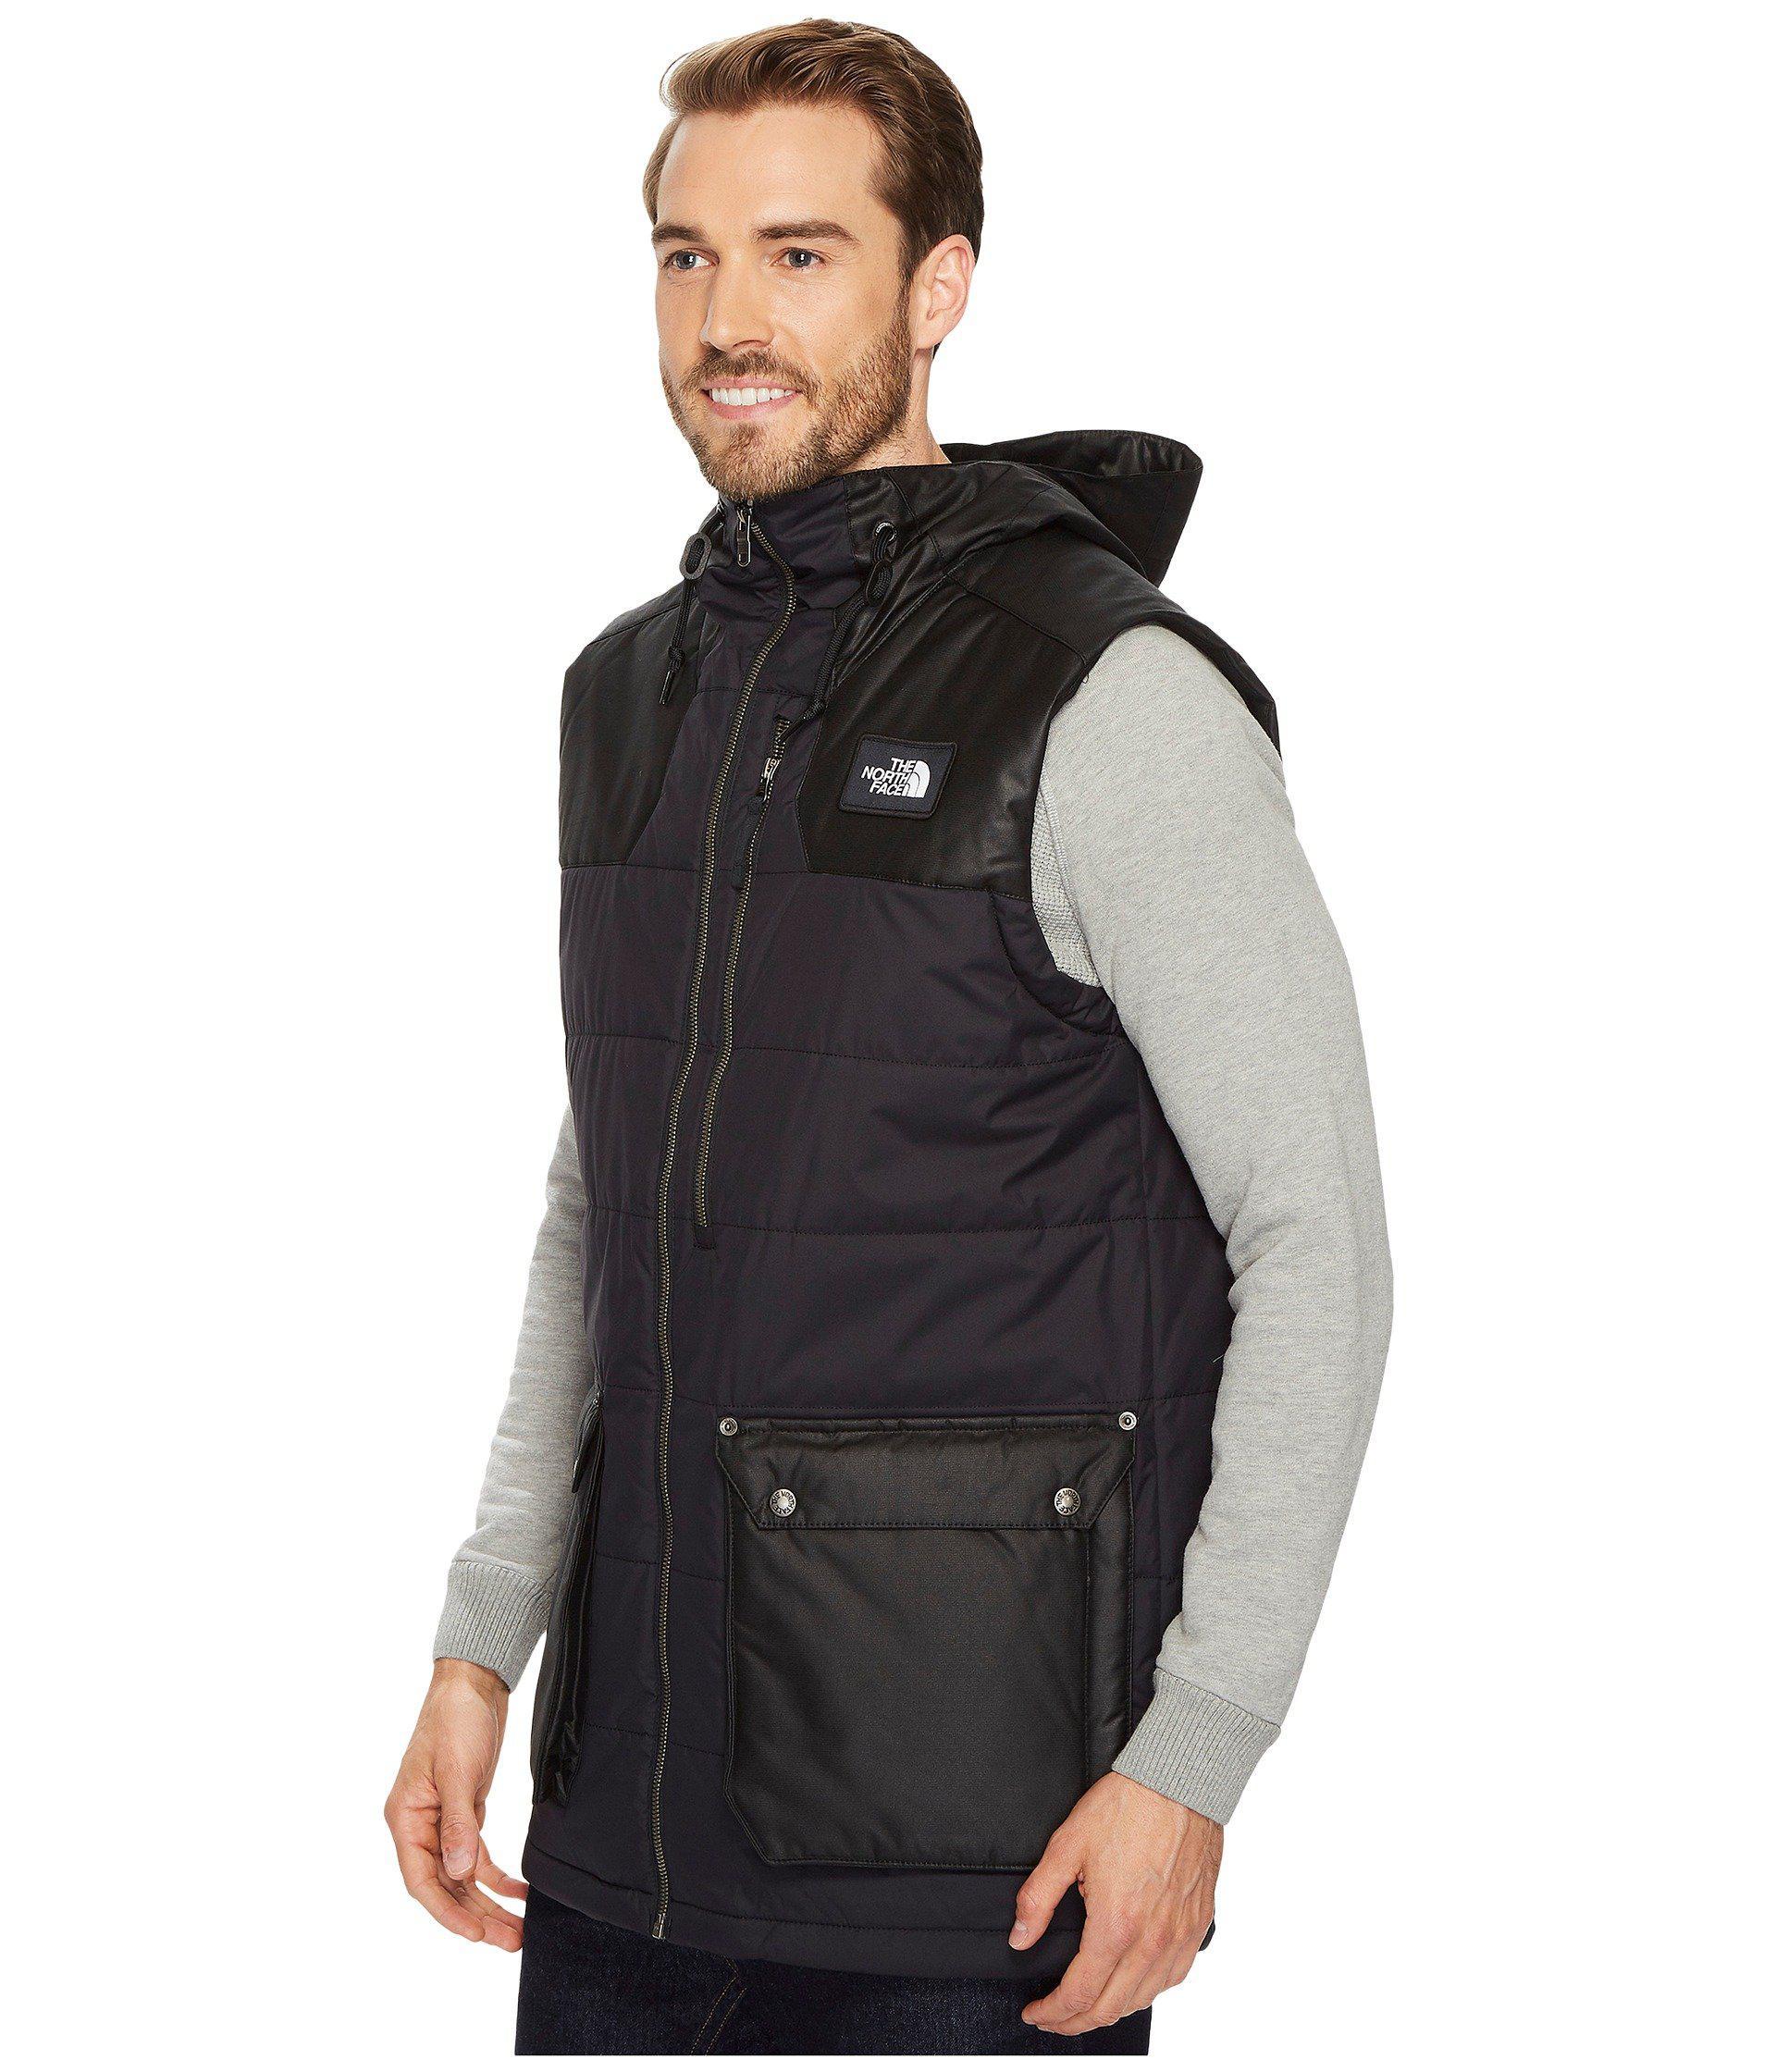 Lyst - The North Face Camshaft Vest in Black for Men - Save 29% b9e898d2b